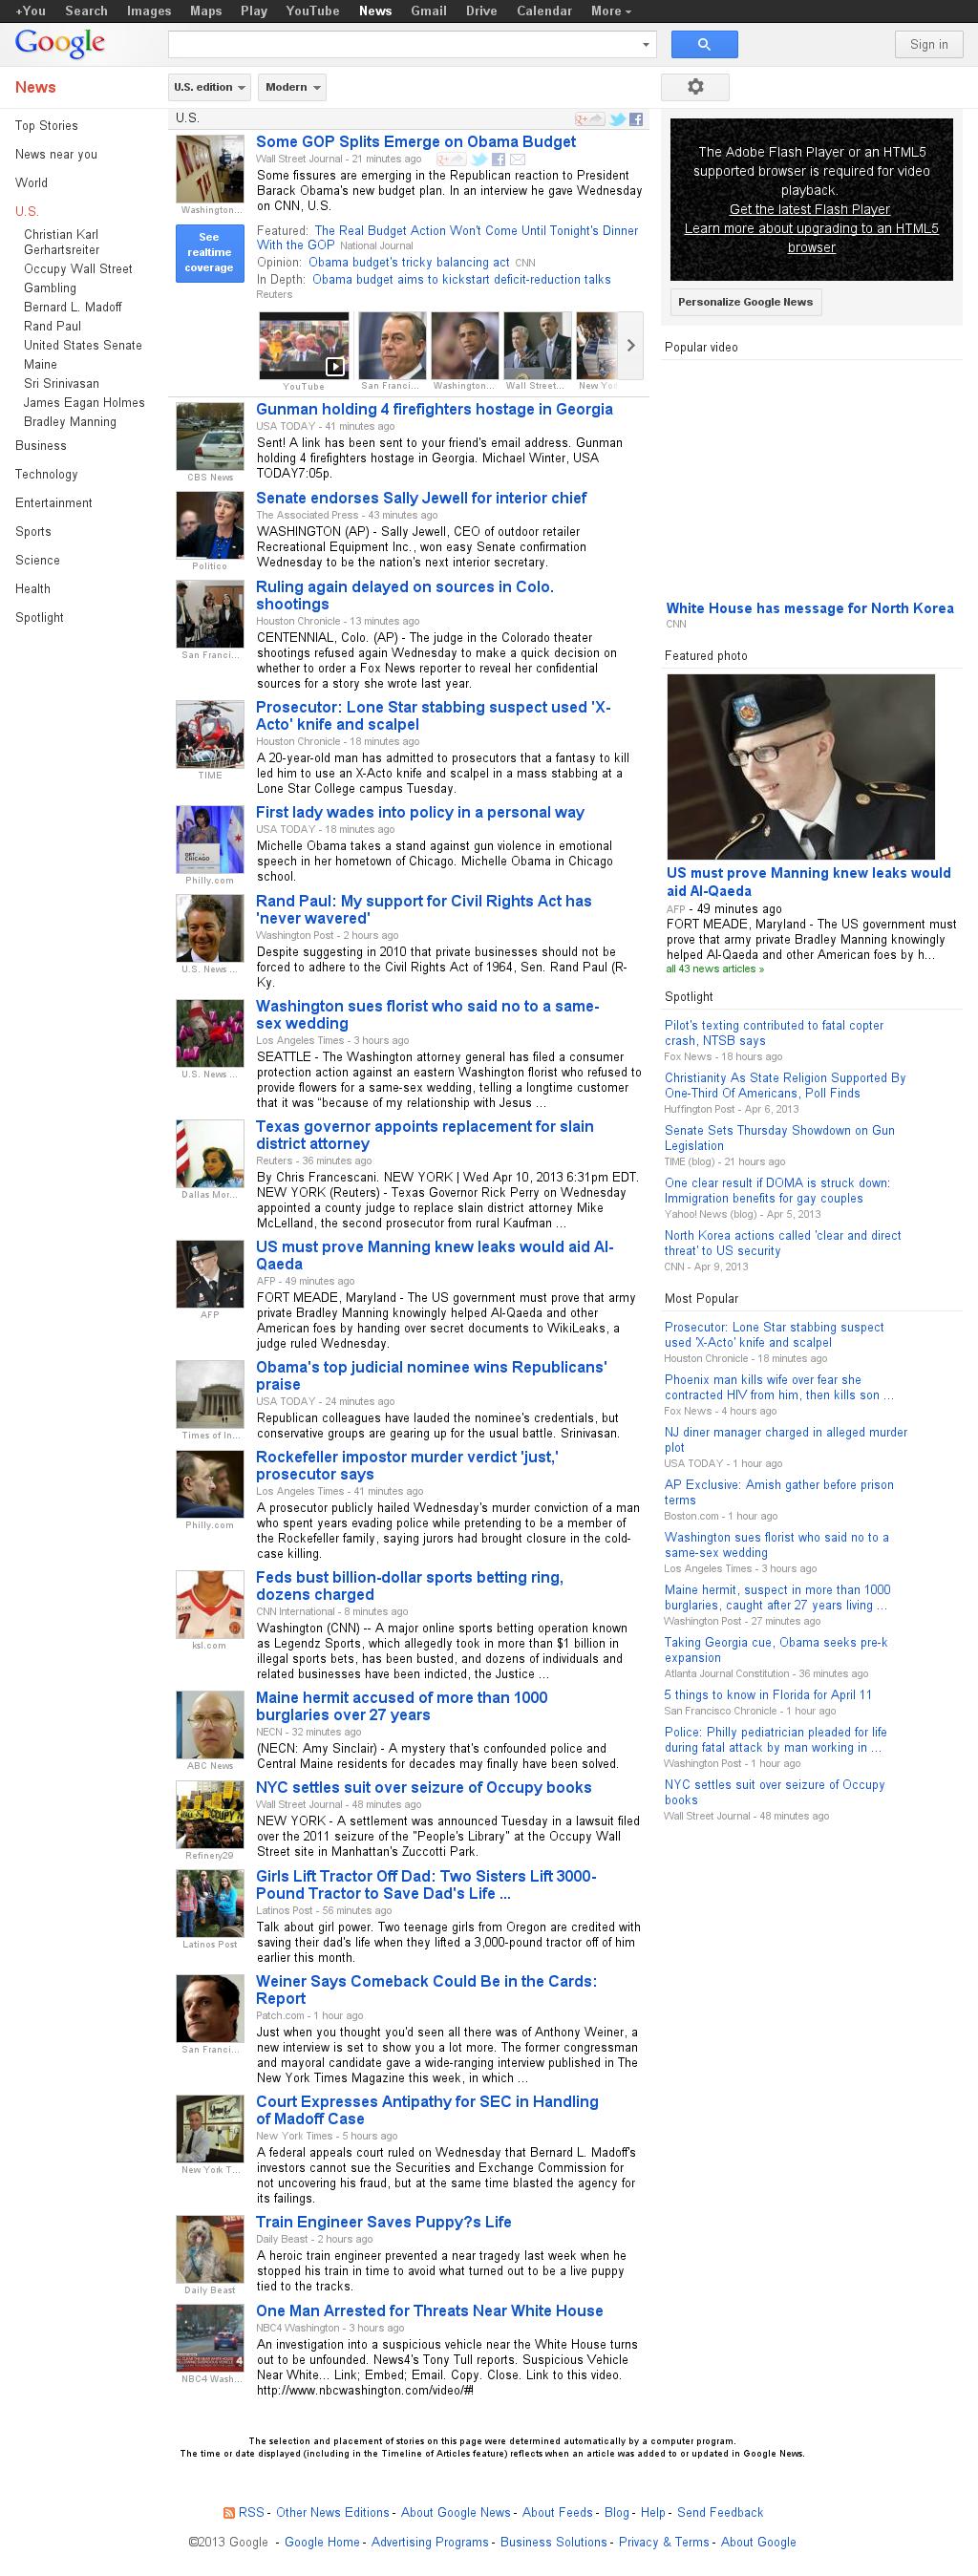 Google News: U.S. at Wednesday April 10, 2013, 11:10 p.m. UTC